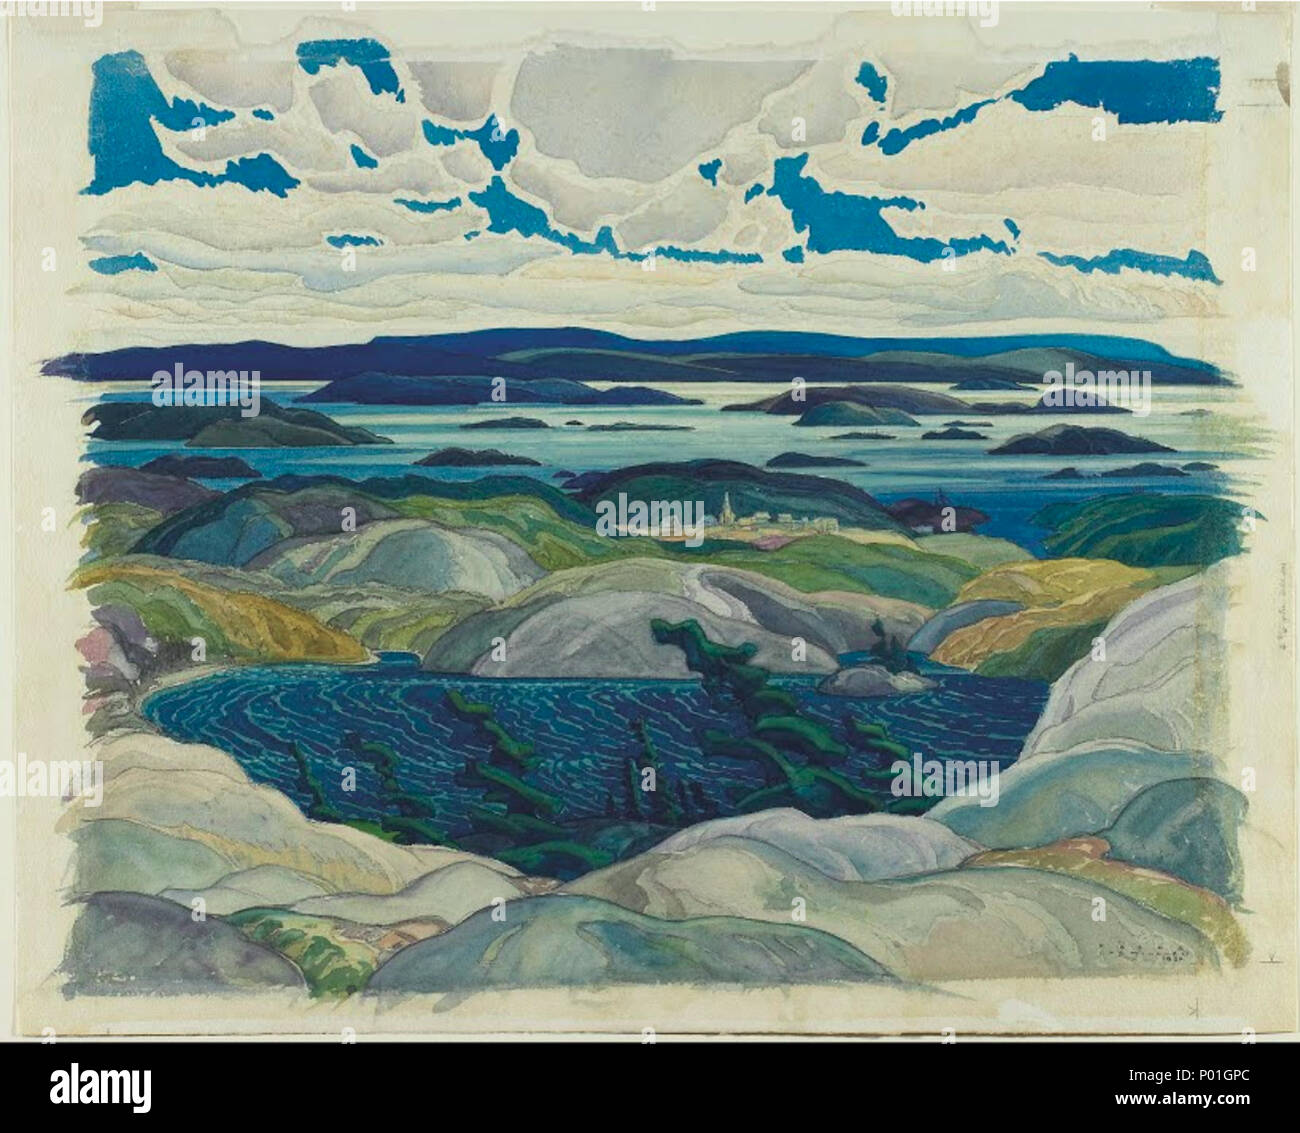 . English: Franklin Carmichael, Bay of Islands, 1930, watercolour on paper, 51.3 x 64.4 cm 1 Franklin Carmichael - Bay of Islands Stock Photo